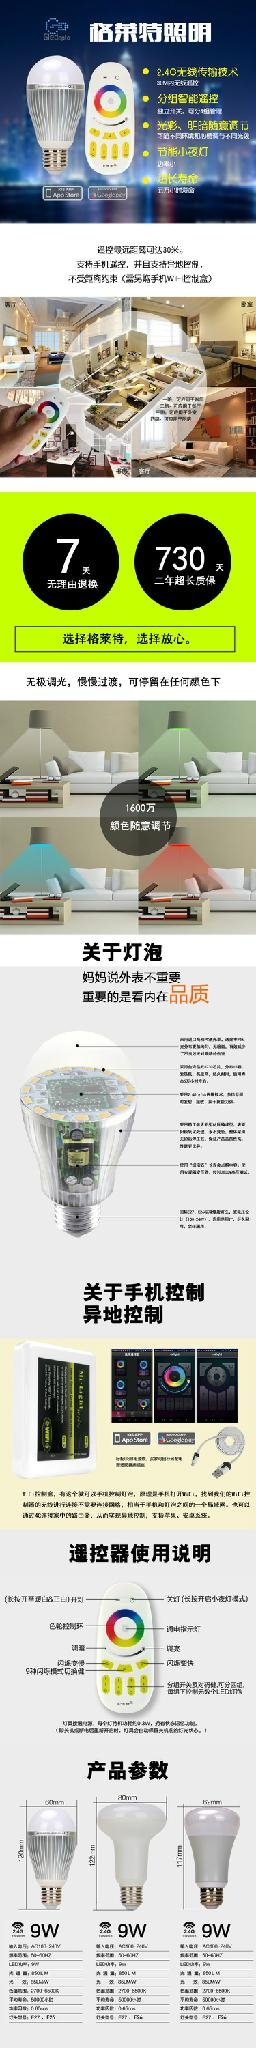 9w智能燈泡七彩變色調光無線遙控LED節能燈 3